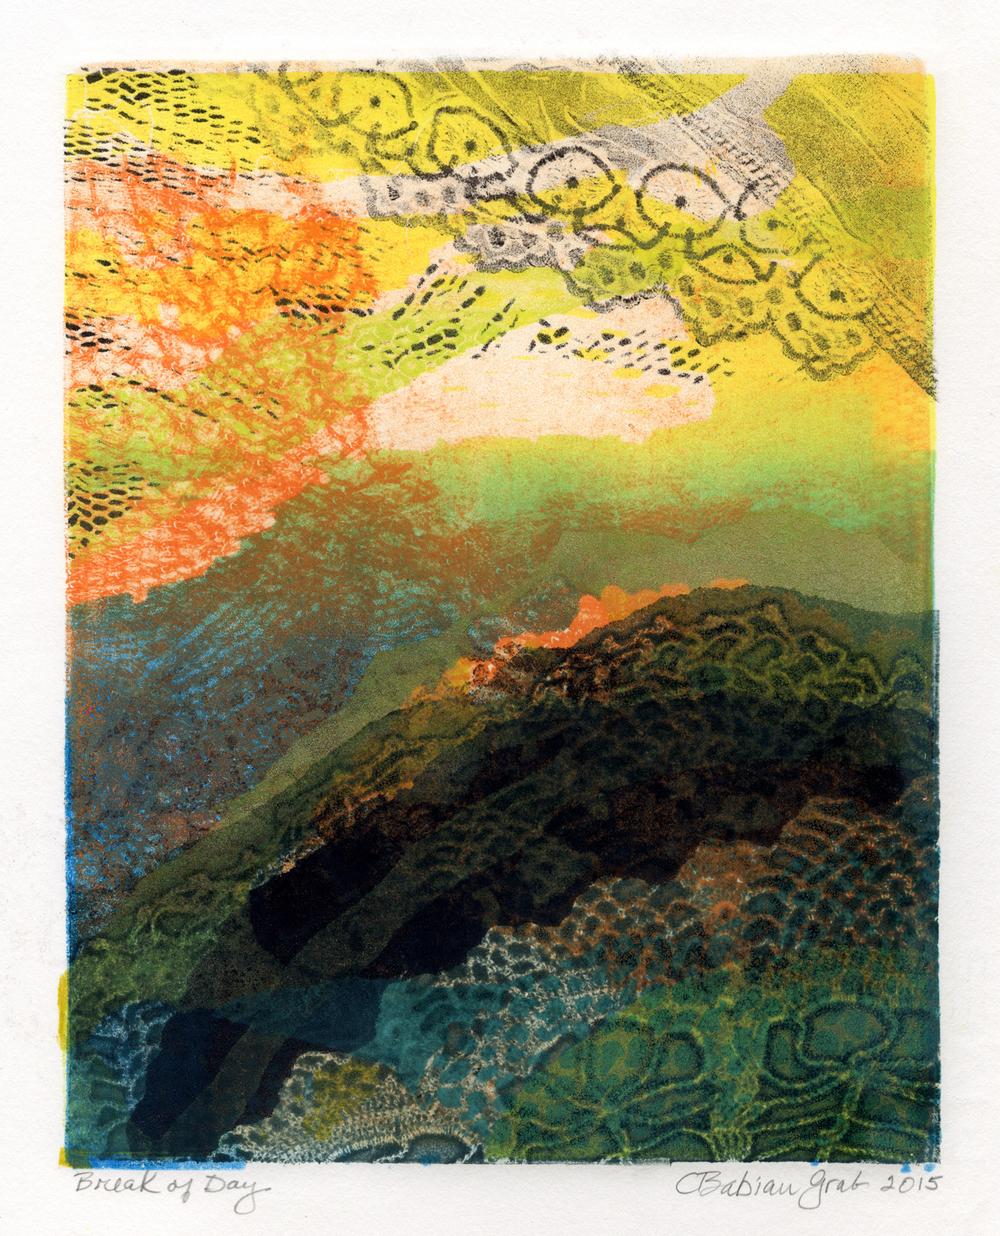 Break of Day,  monotype, 11 x 9 inches, 2015